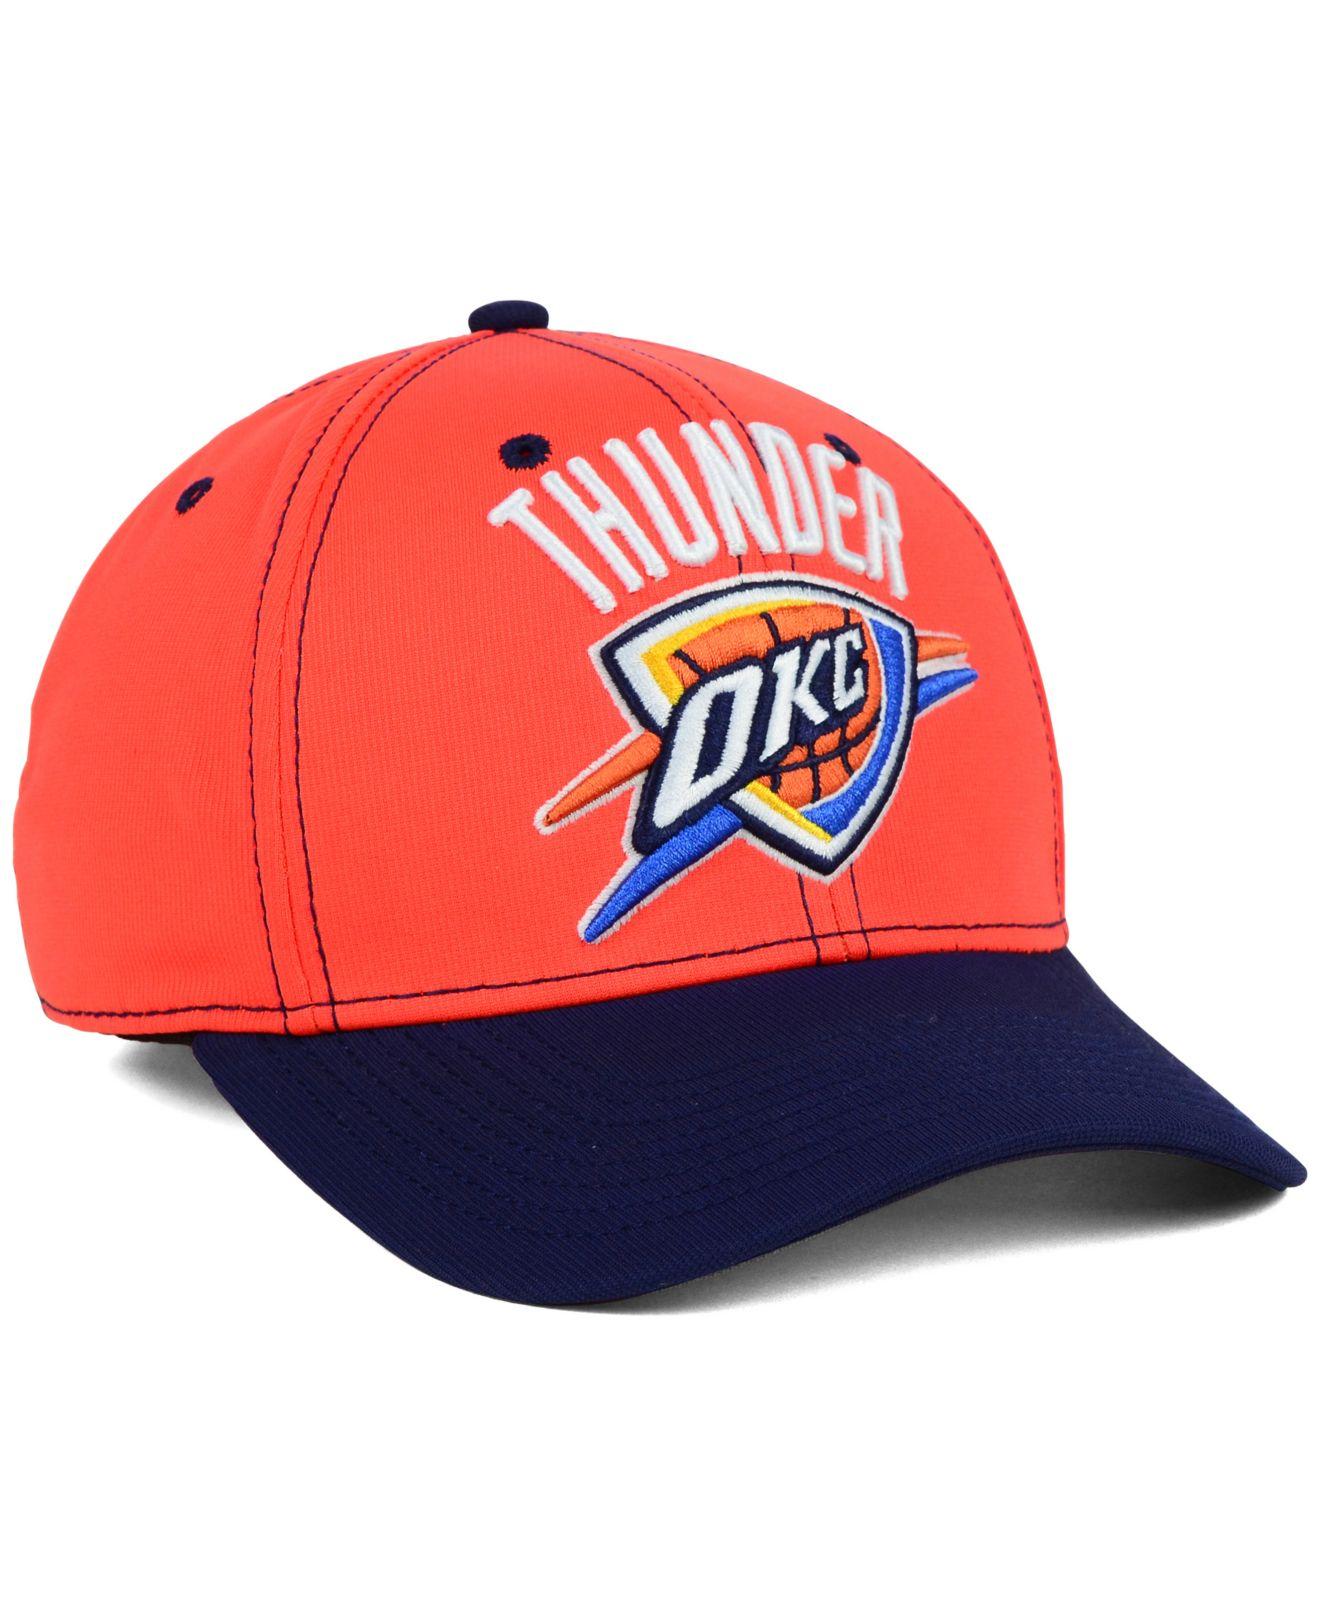 reputable site 6a546 ce6a6 Lyst - adidas Oklahoma City Thunder 2-Tone Flex Cap in Orange for Men